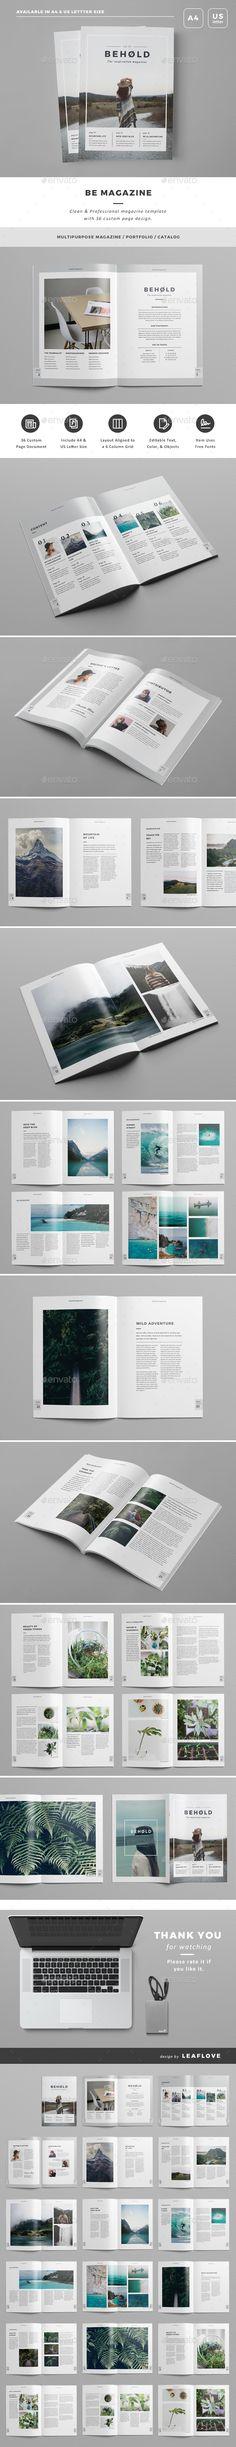 Be Magazine - Magazines Print Templates | Download: https://graphicriver.net/item/be-magazine/18938614?ref=sinzo